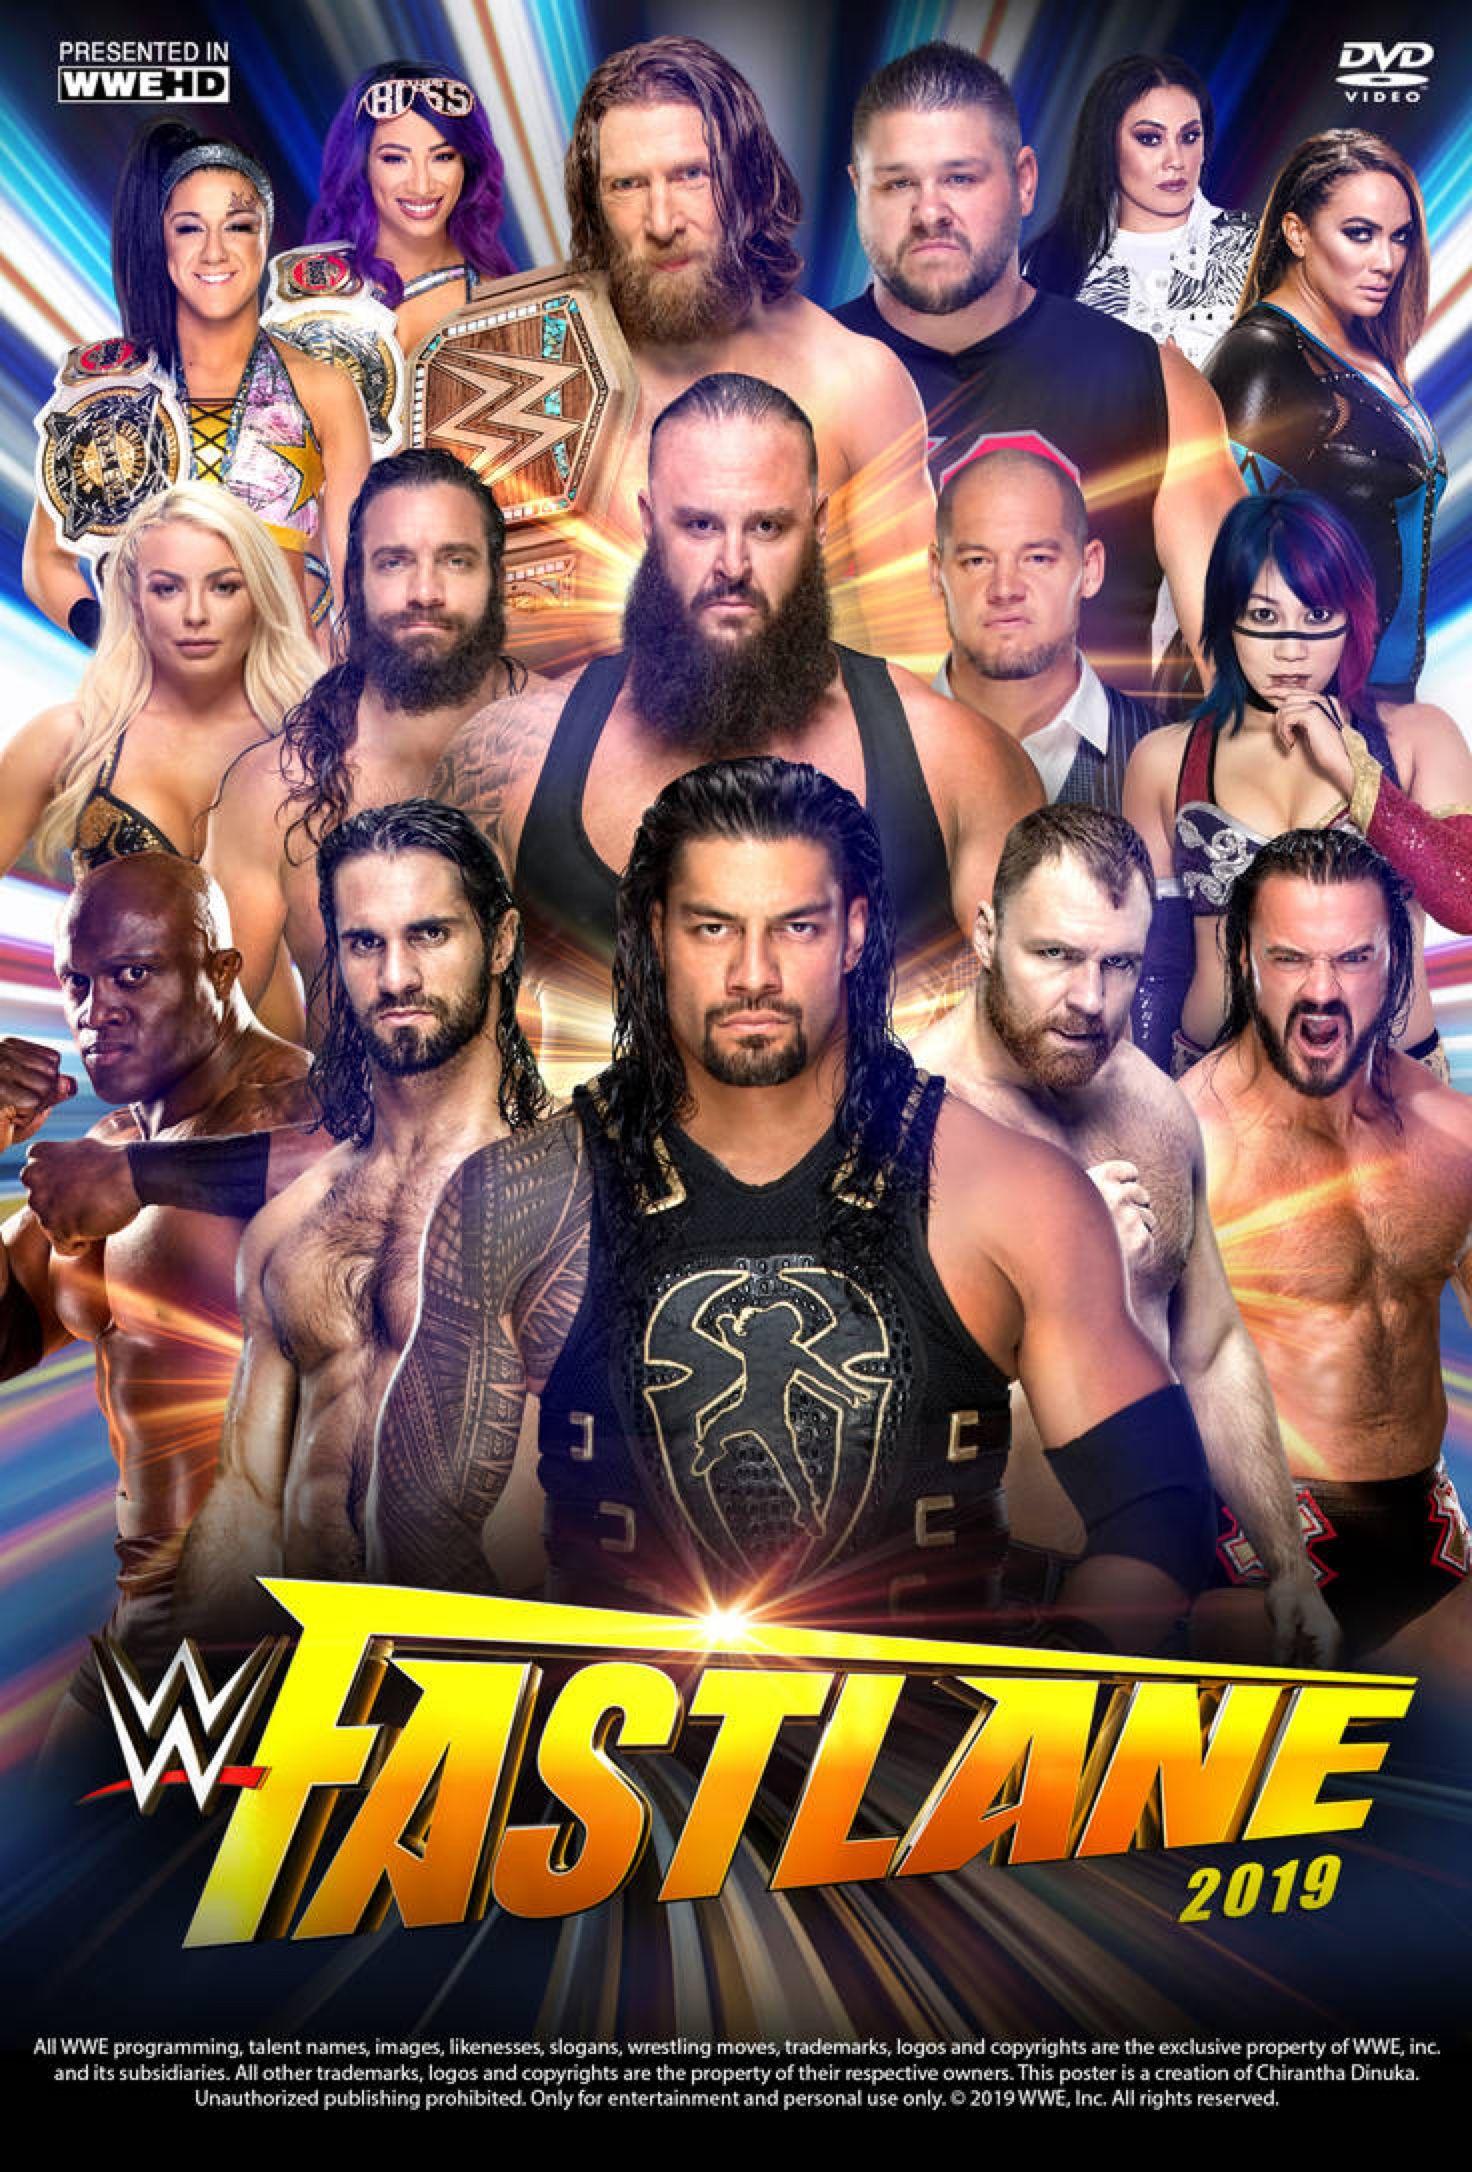 WWE Fastlane 2019 Poster by Chirantha on @DeviantArt | Pro